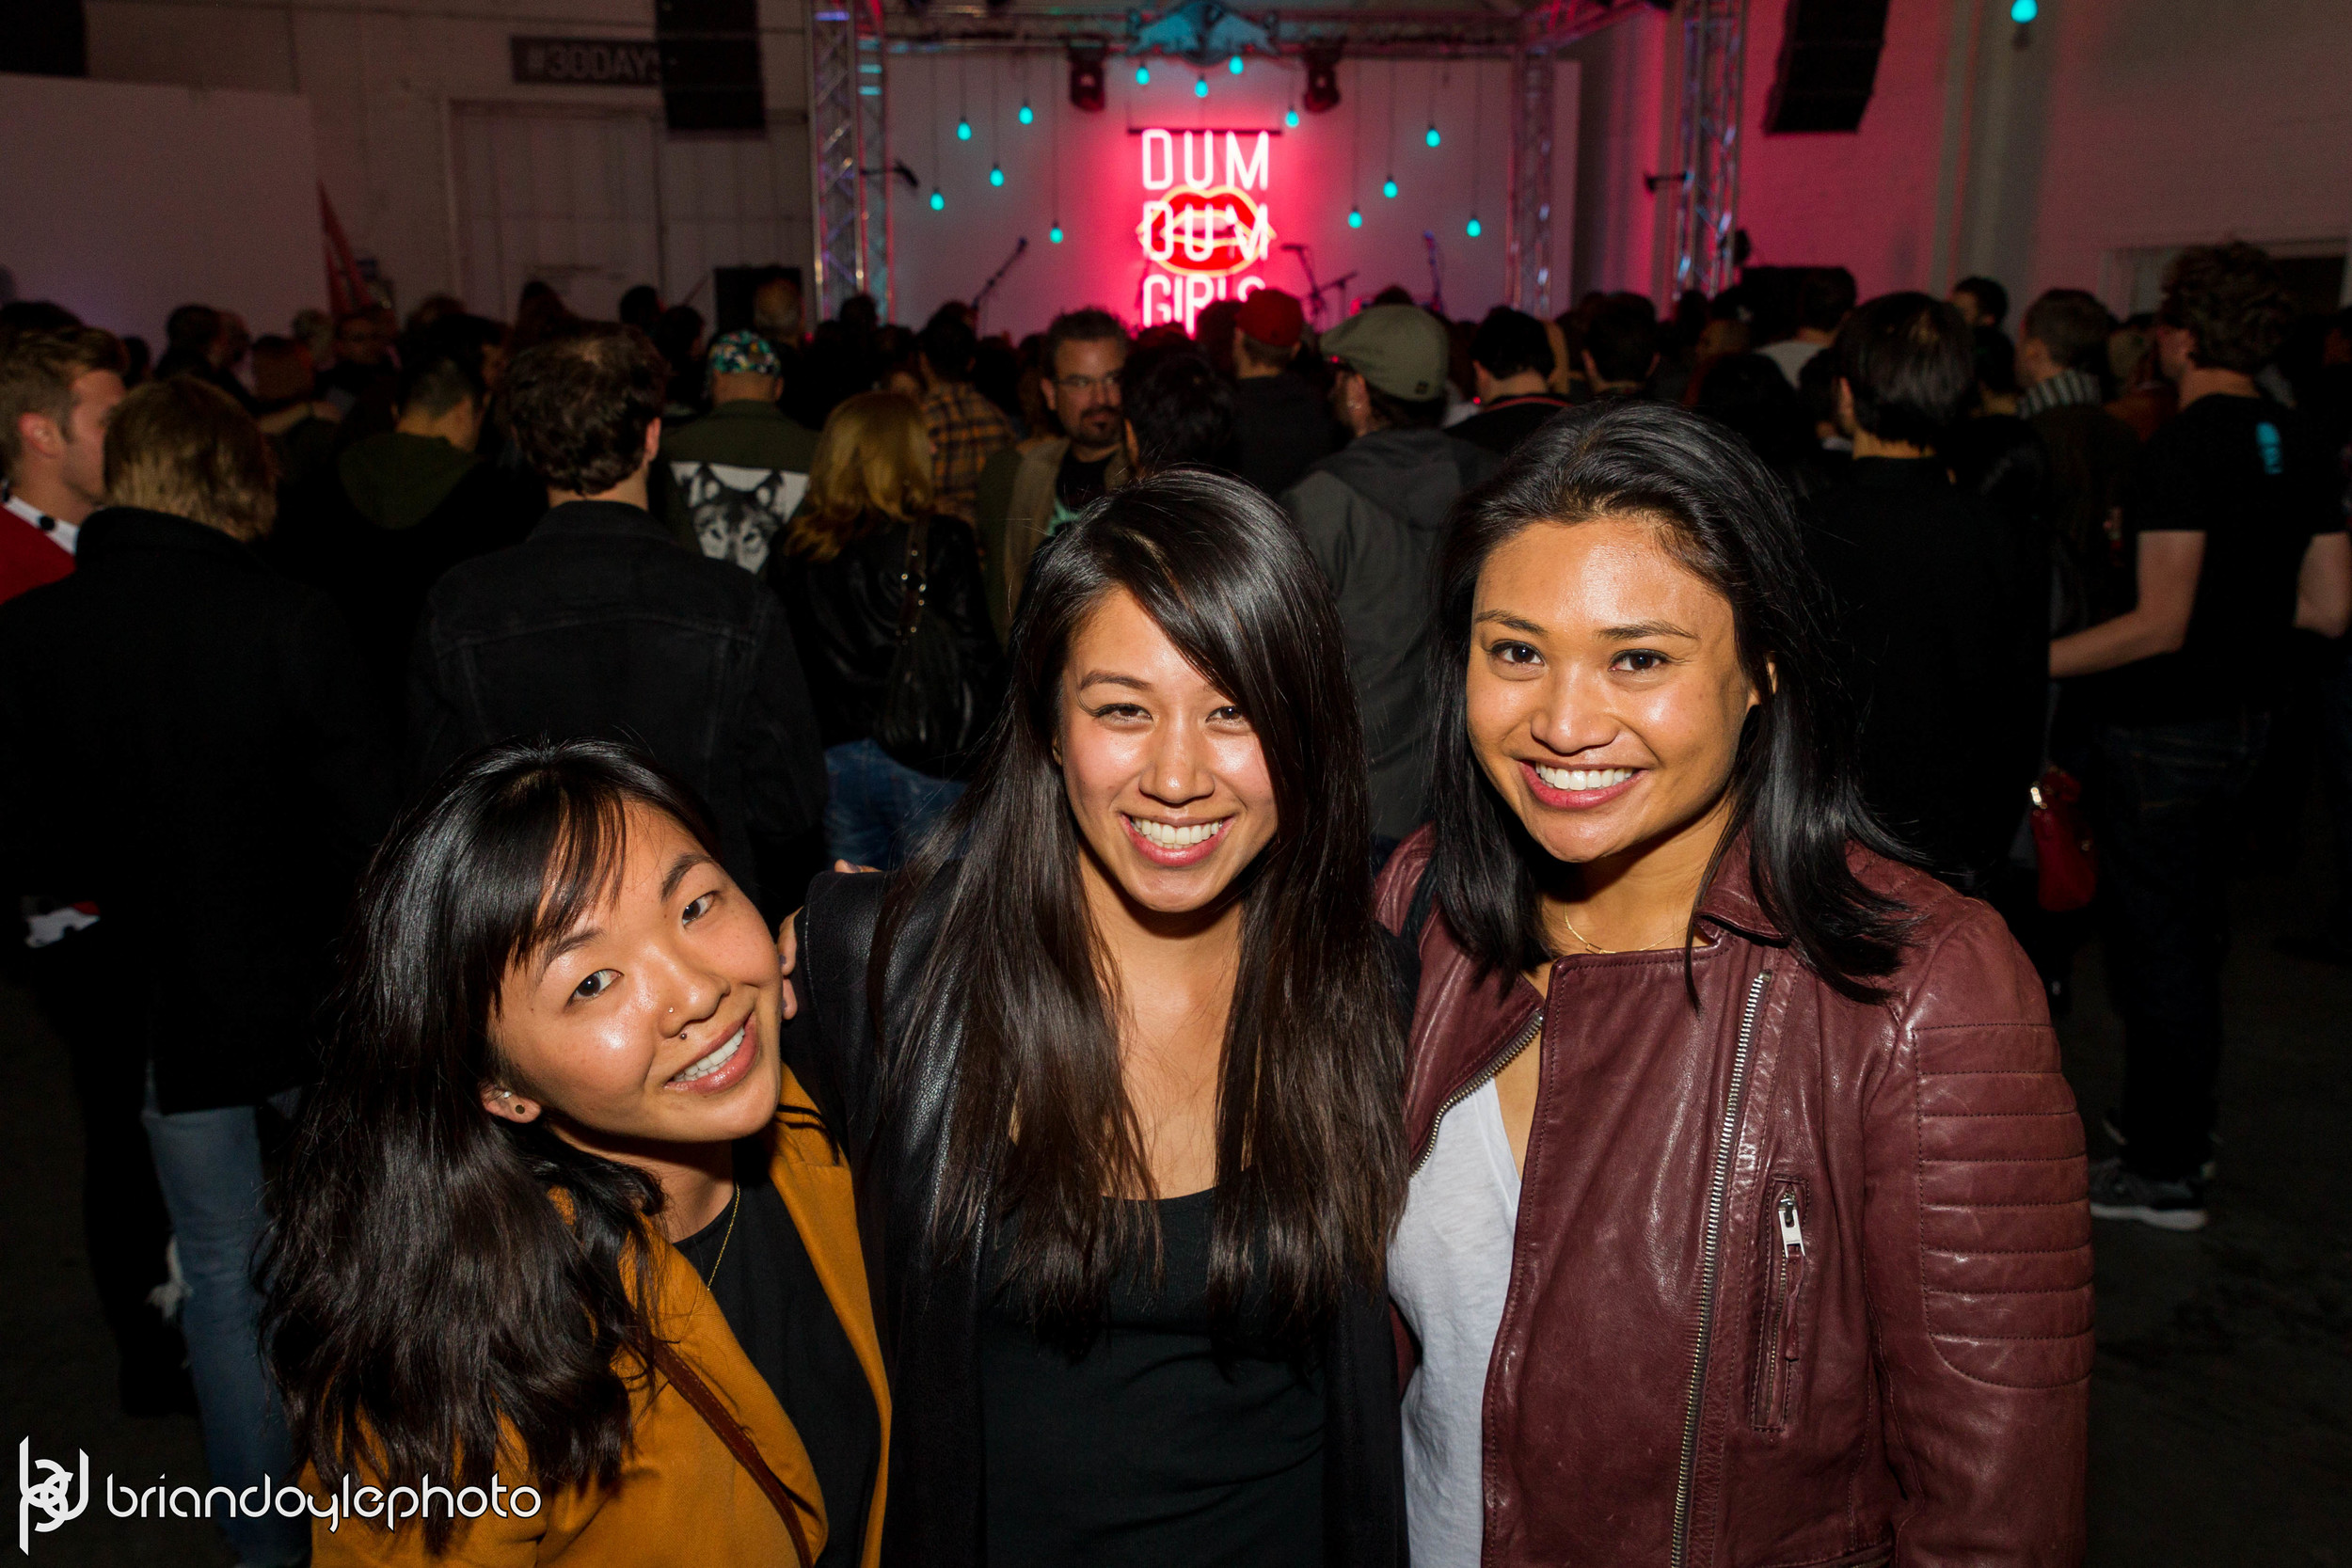 Red Bull - Dum Dum Girls, Tropicana and the Flea, Lowell @ The Well 2014.11.16-40.jpg